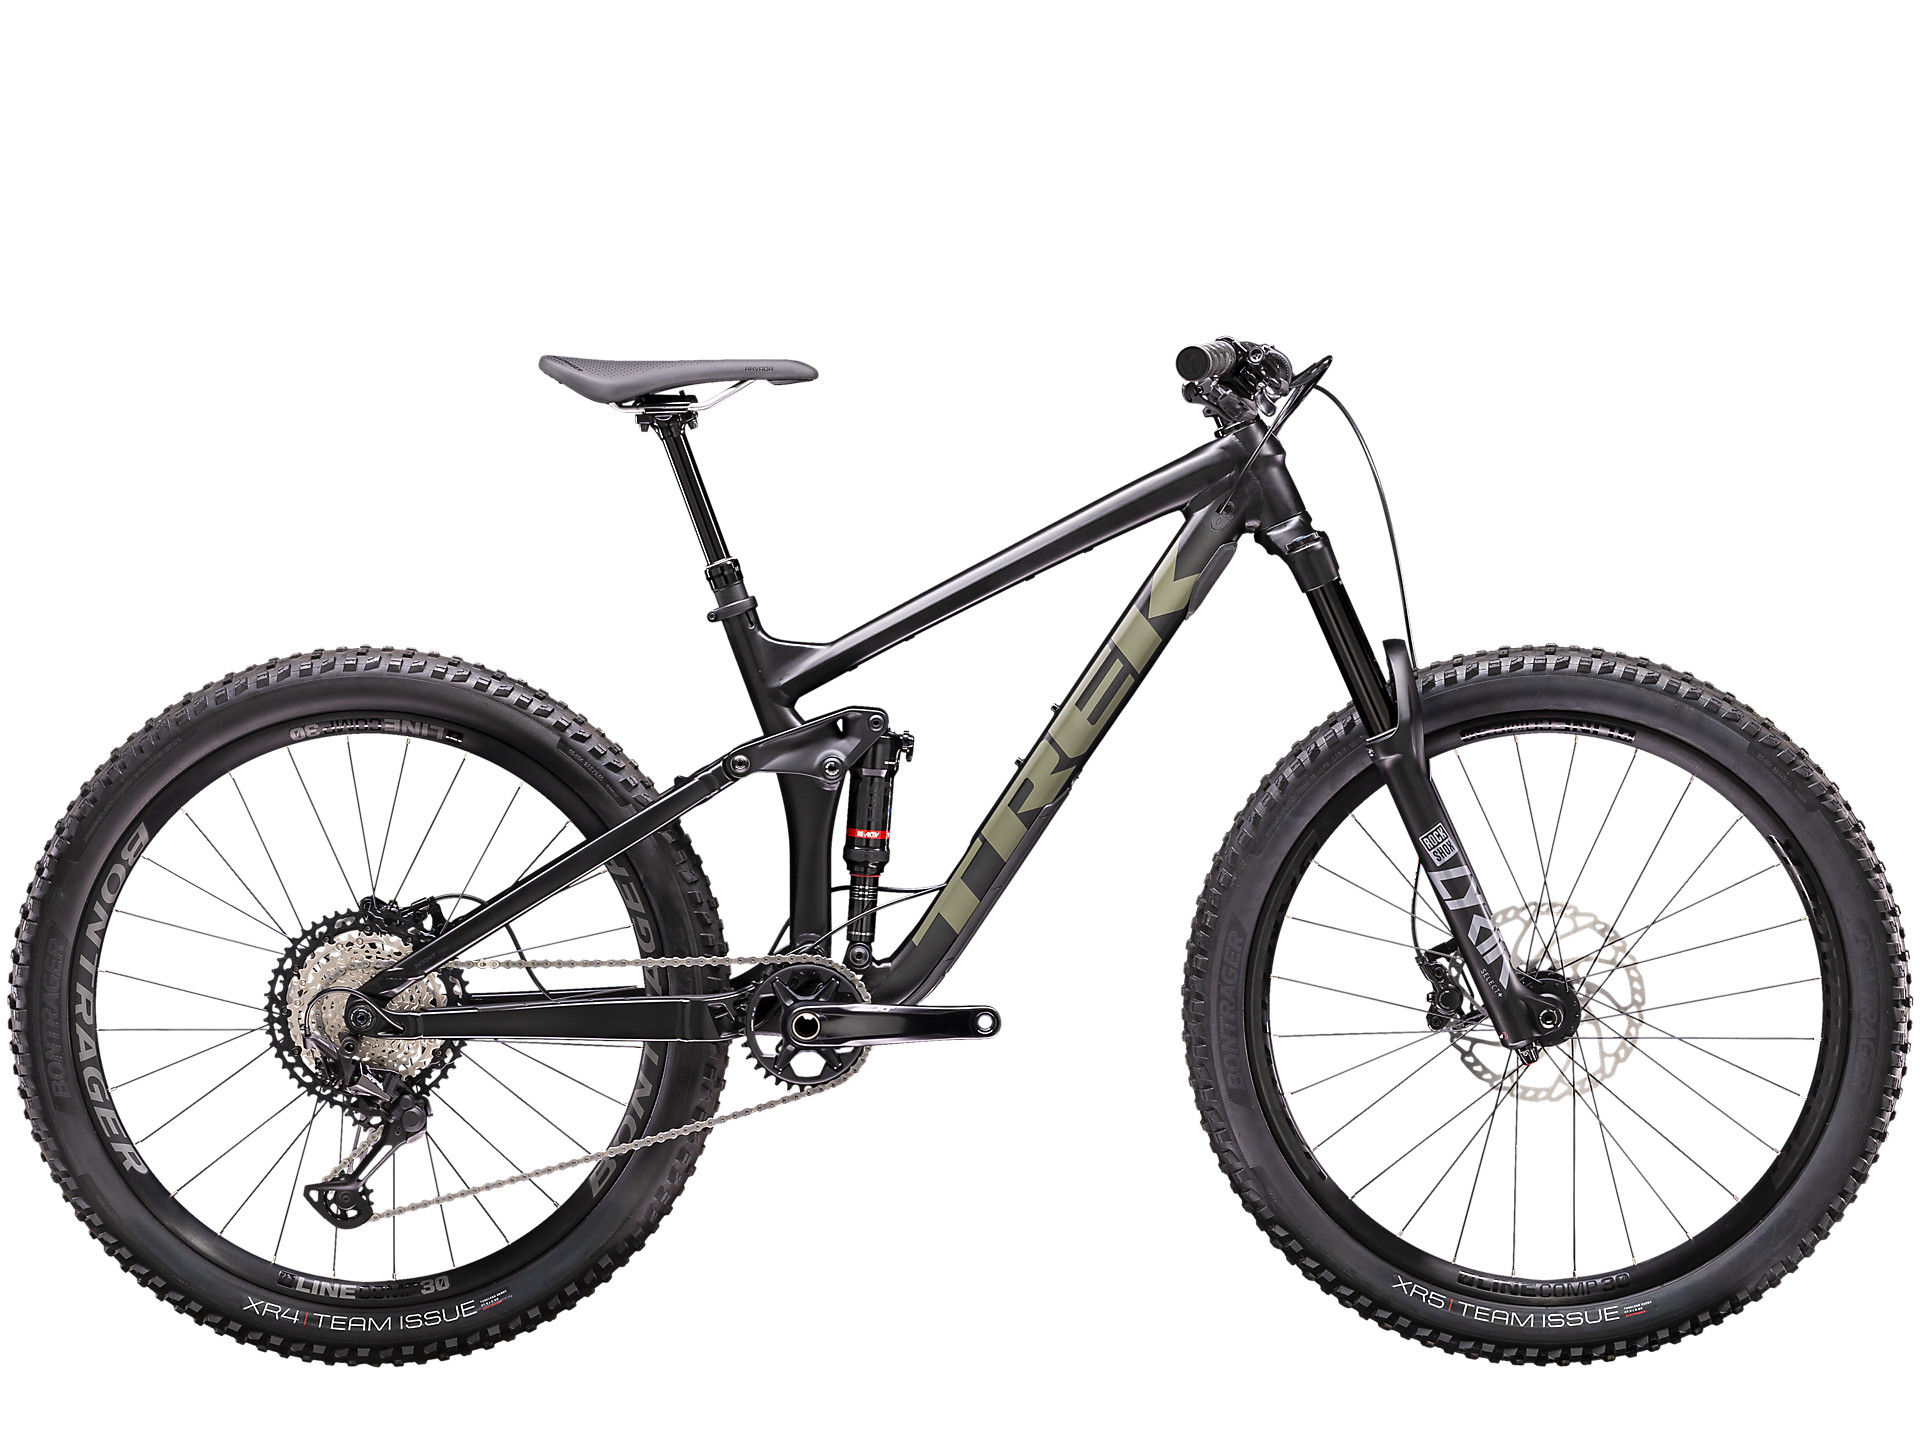 Remedy 8 275 Trek Bikes It